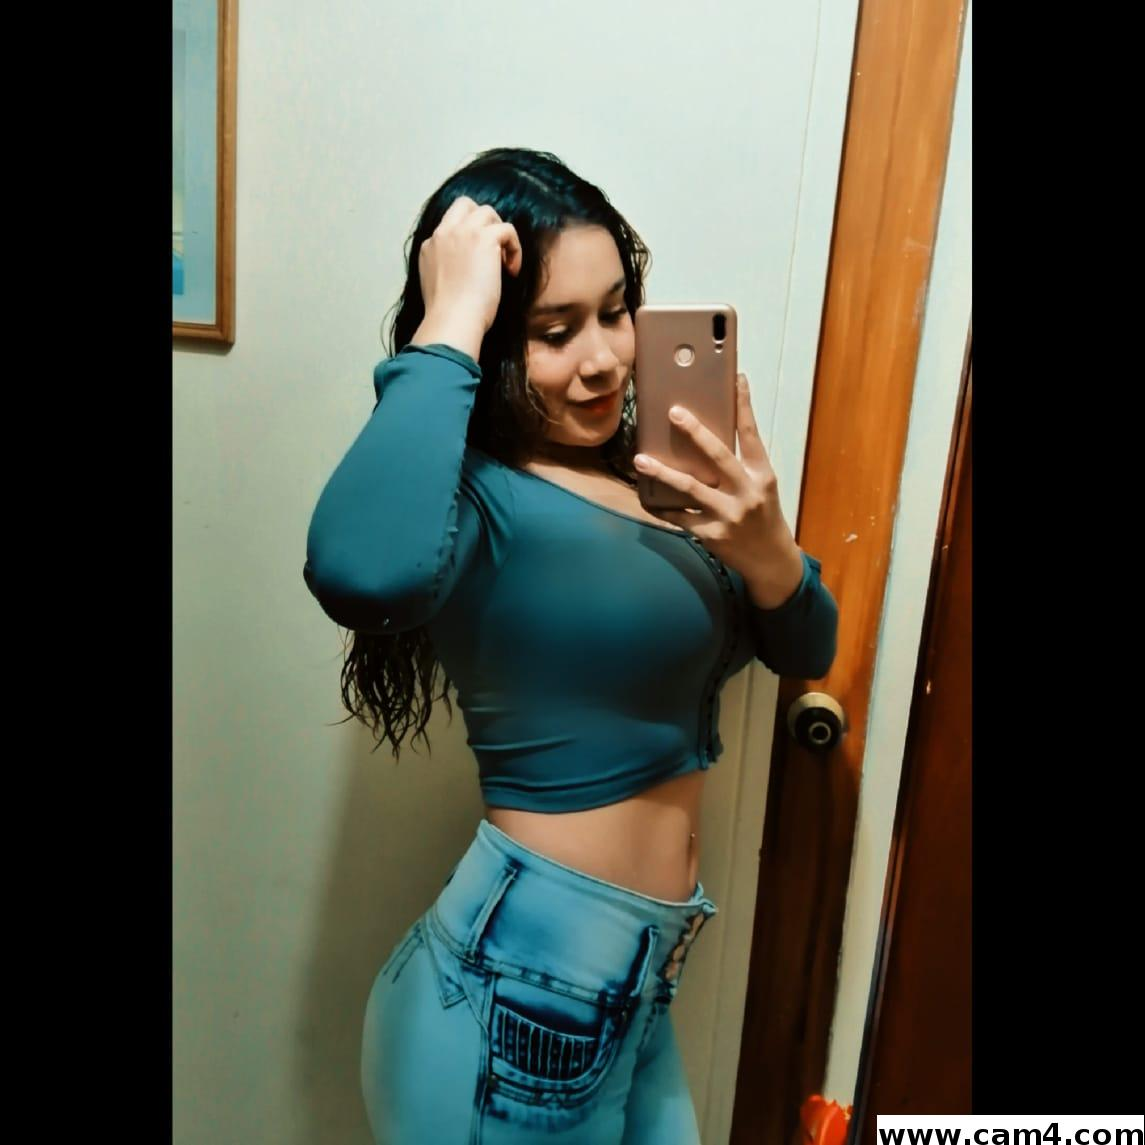 Samantha3 ?s=rbmusnkfqnpsjzqck3qy0dyfccb2fnb+m0suhtdksxy=